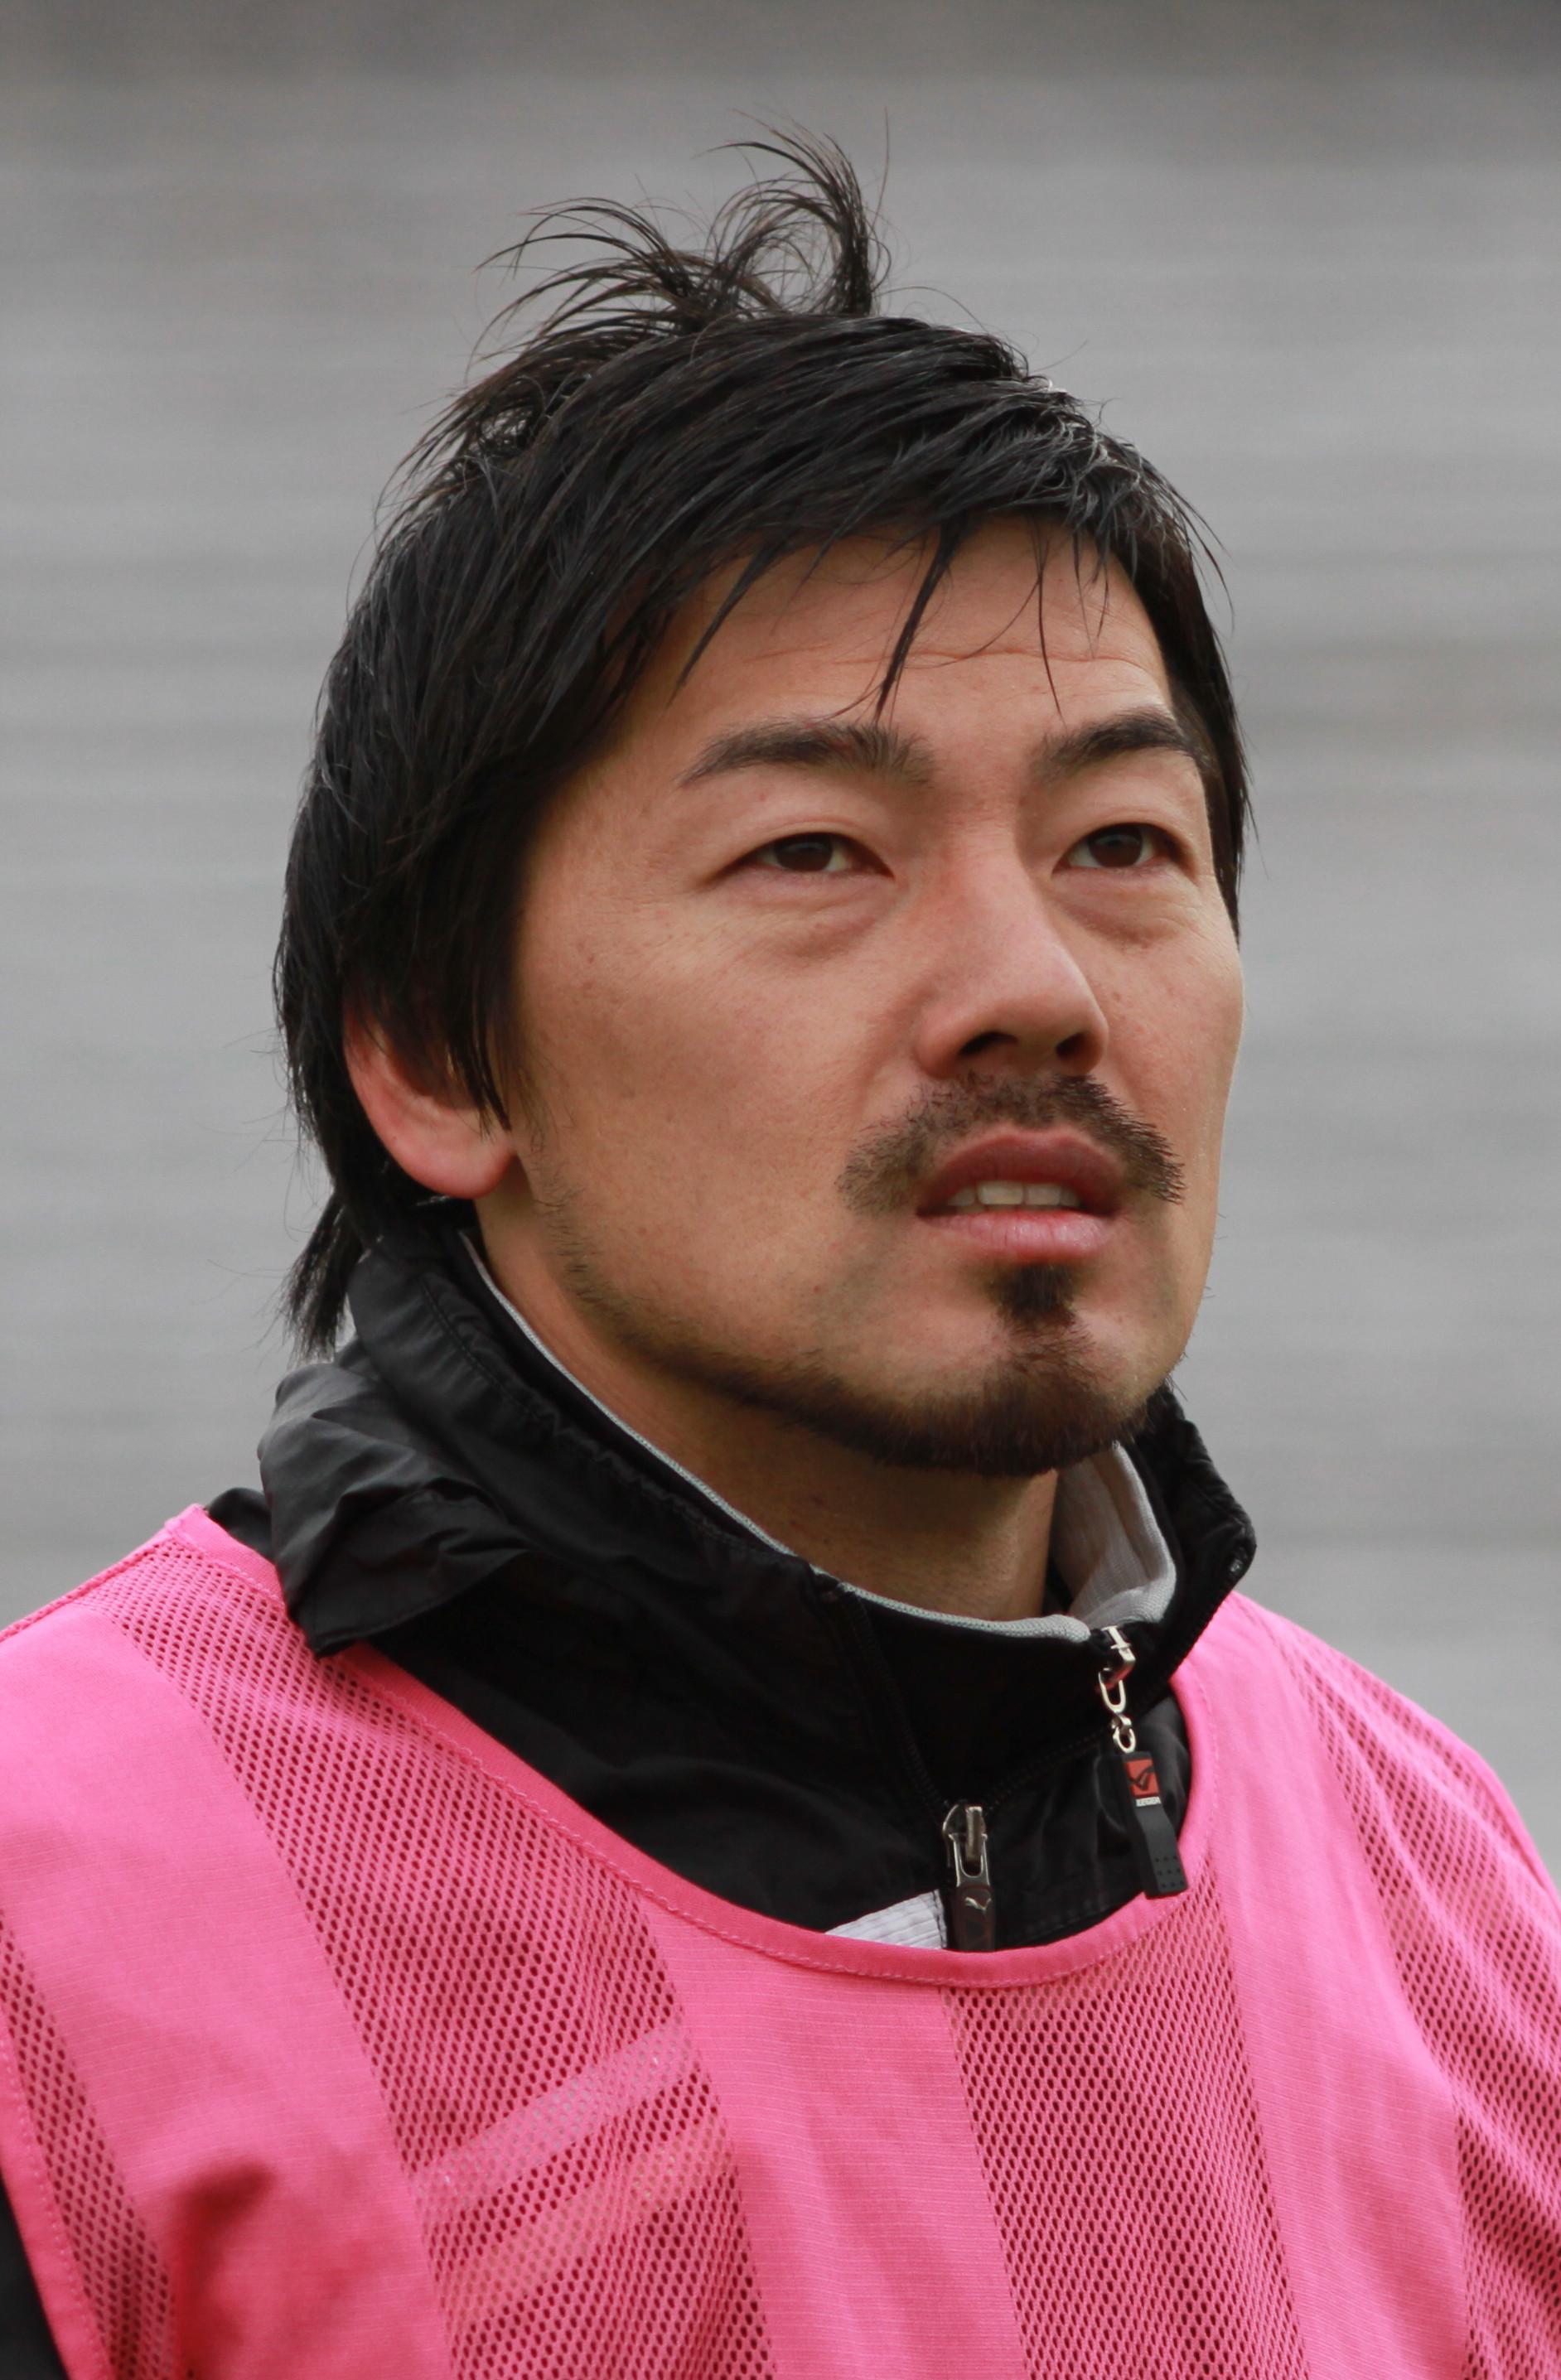 松井大輔 - Wikipedia